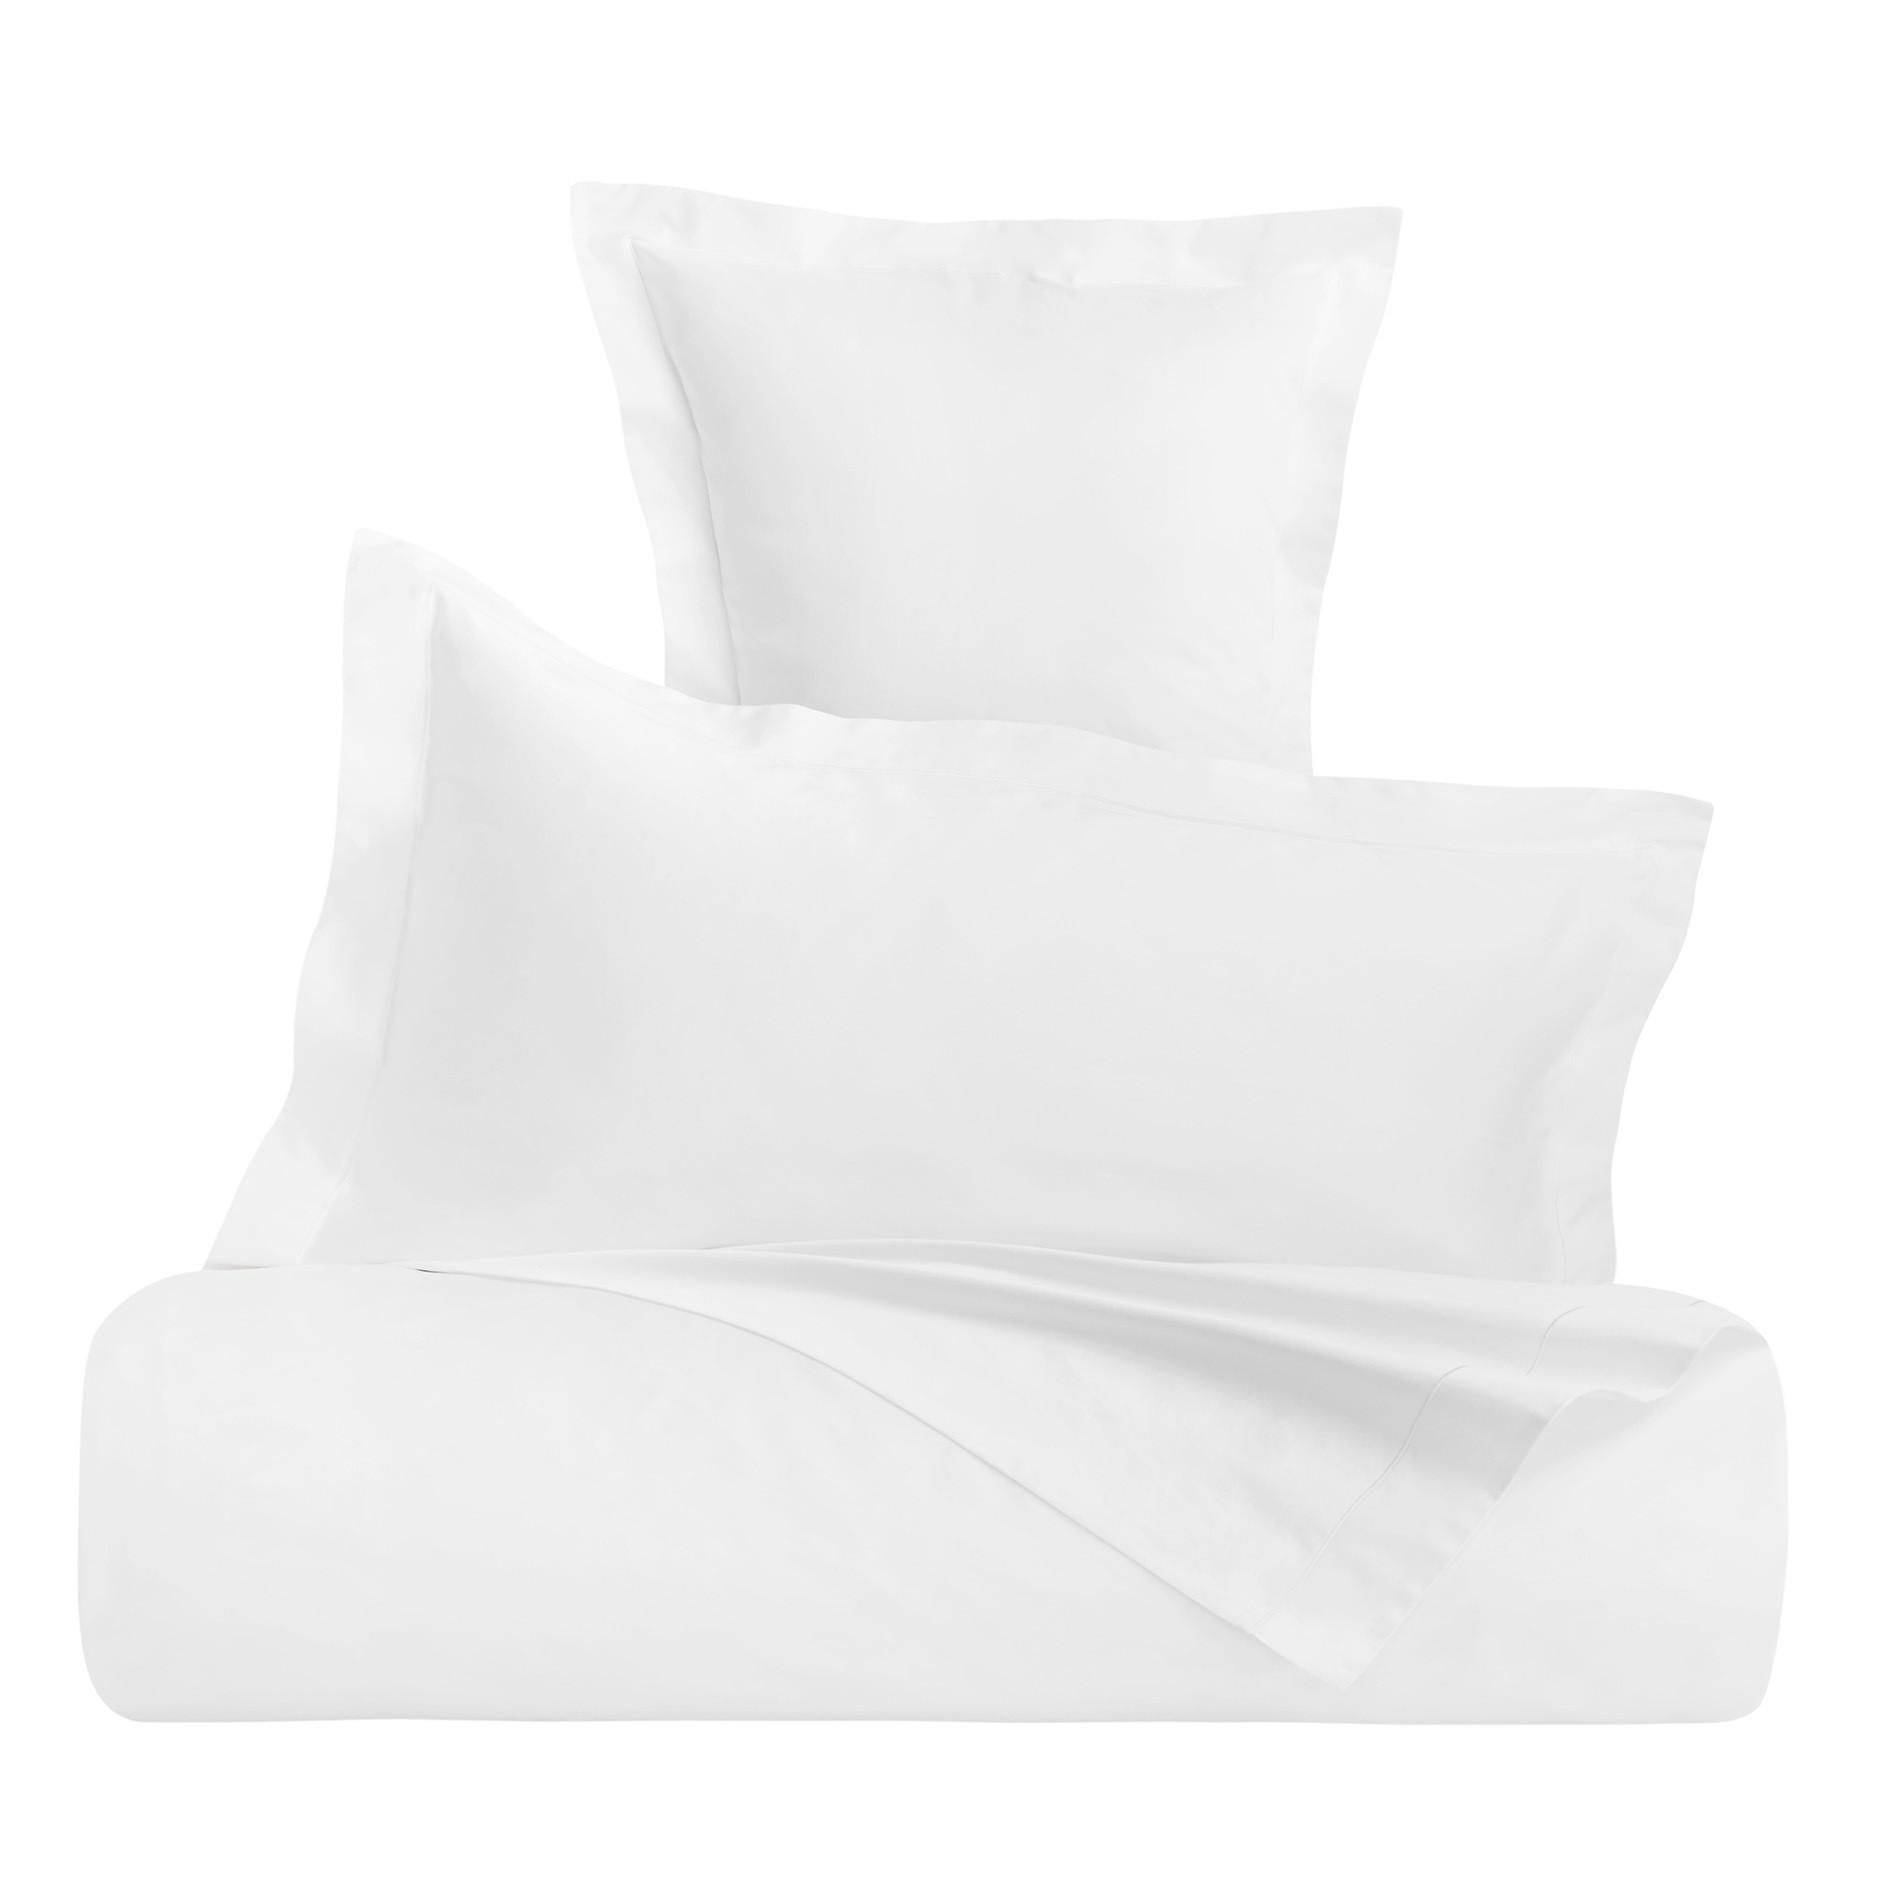 Lenzuolo liscio raso alta qualità Interno 11, Bianco, large image number 0